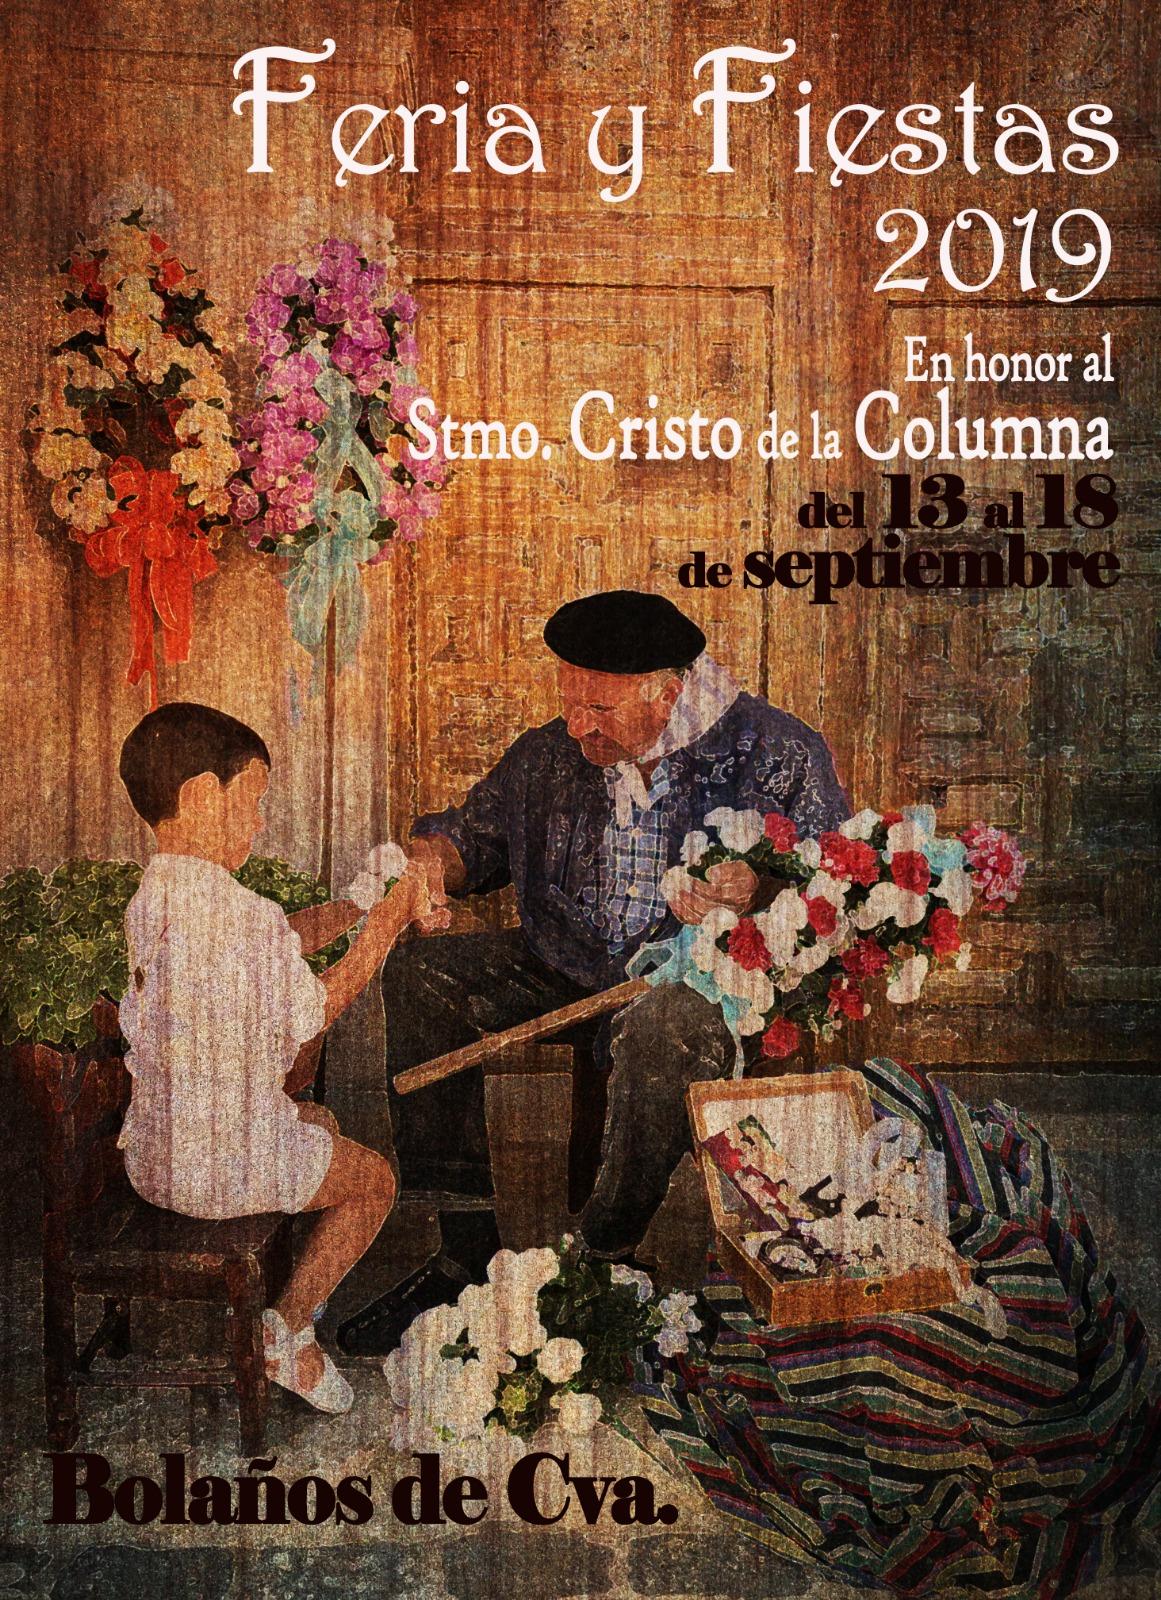 CARTEL DE LA FERIA DEL SANTÍSIMO CRISTO DE LA COLUMNA 2019